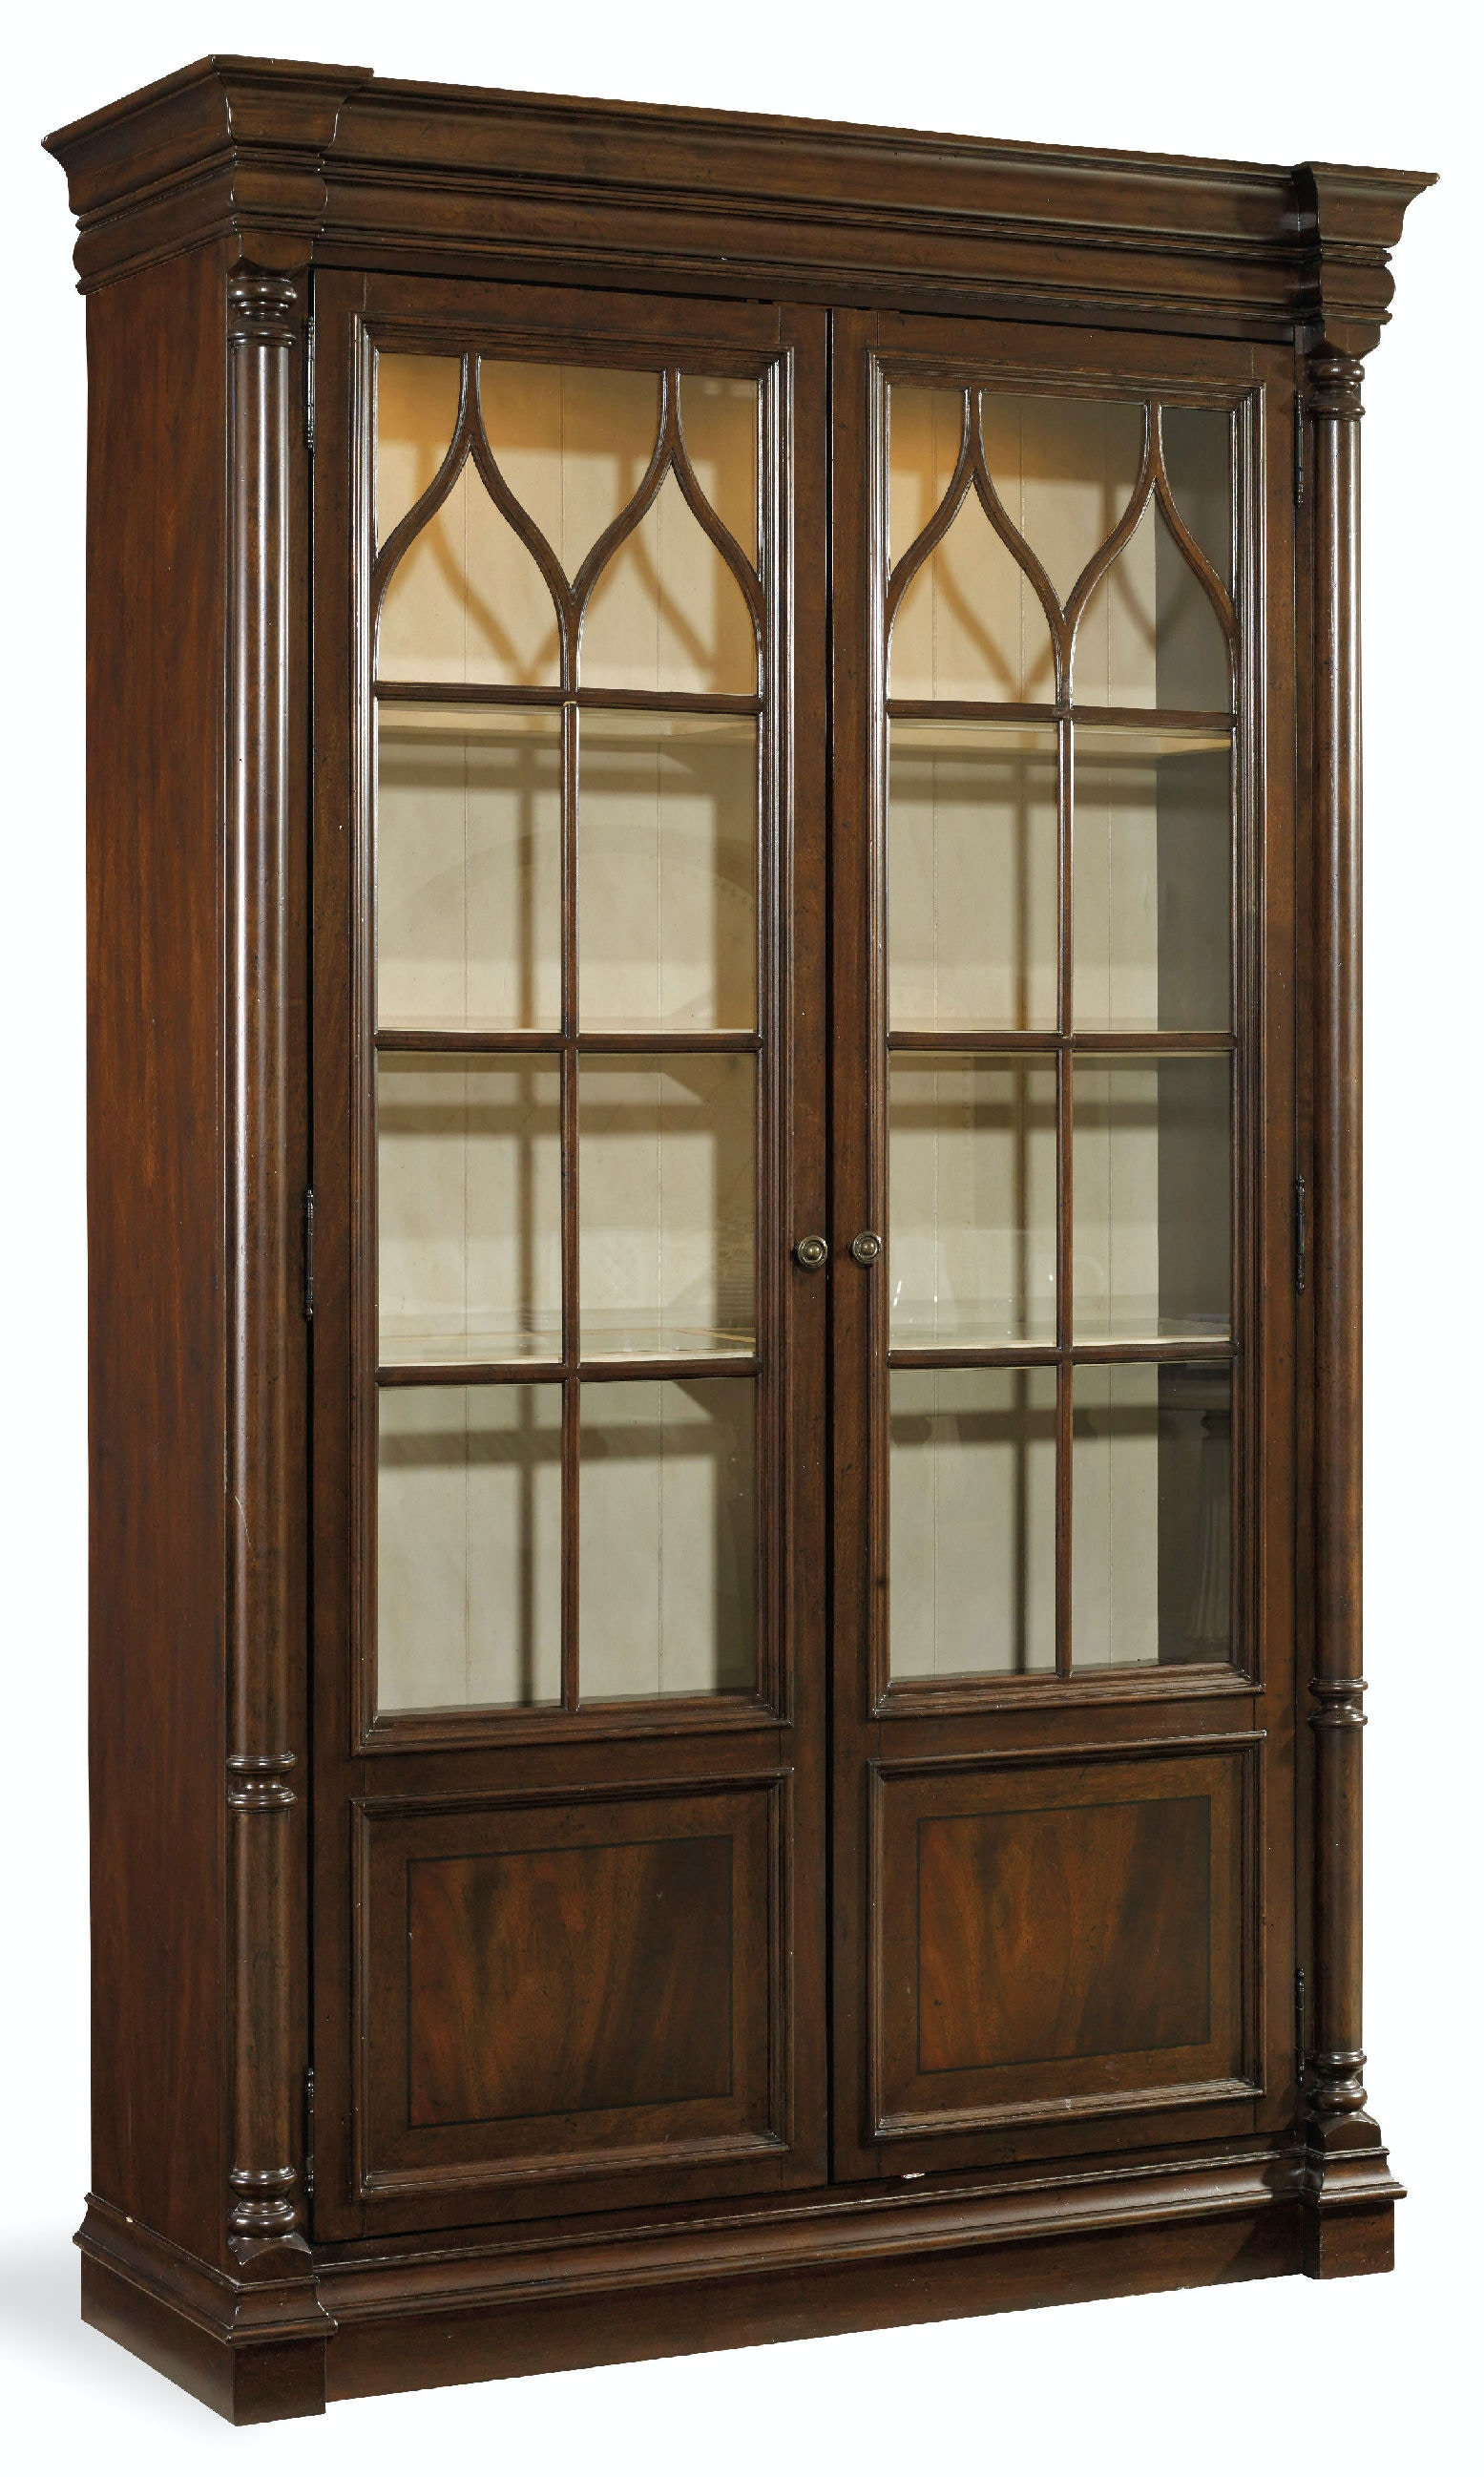 Hooker Furniture Dining Room Leesburg Display Cabinet 5381-75906